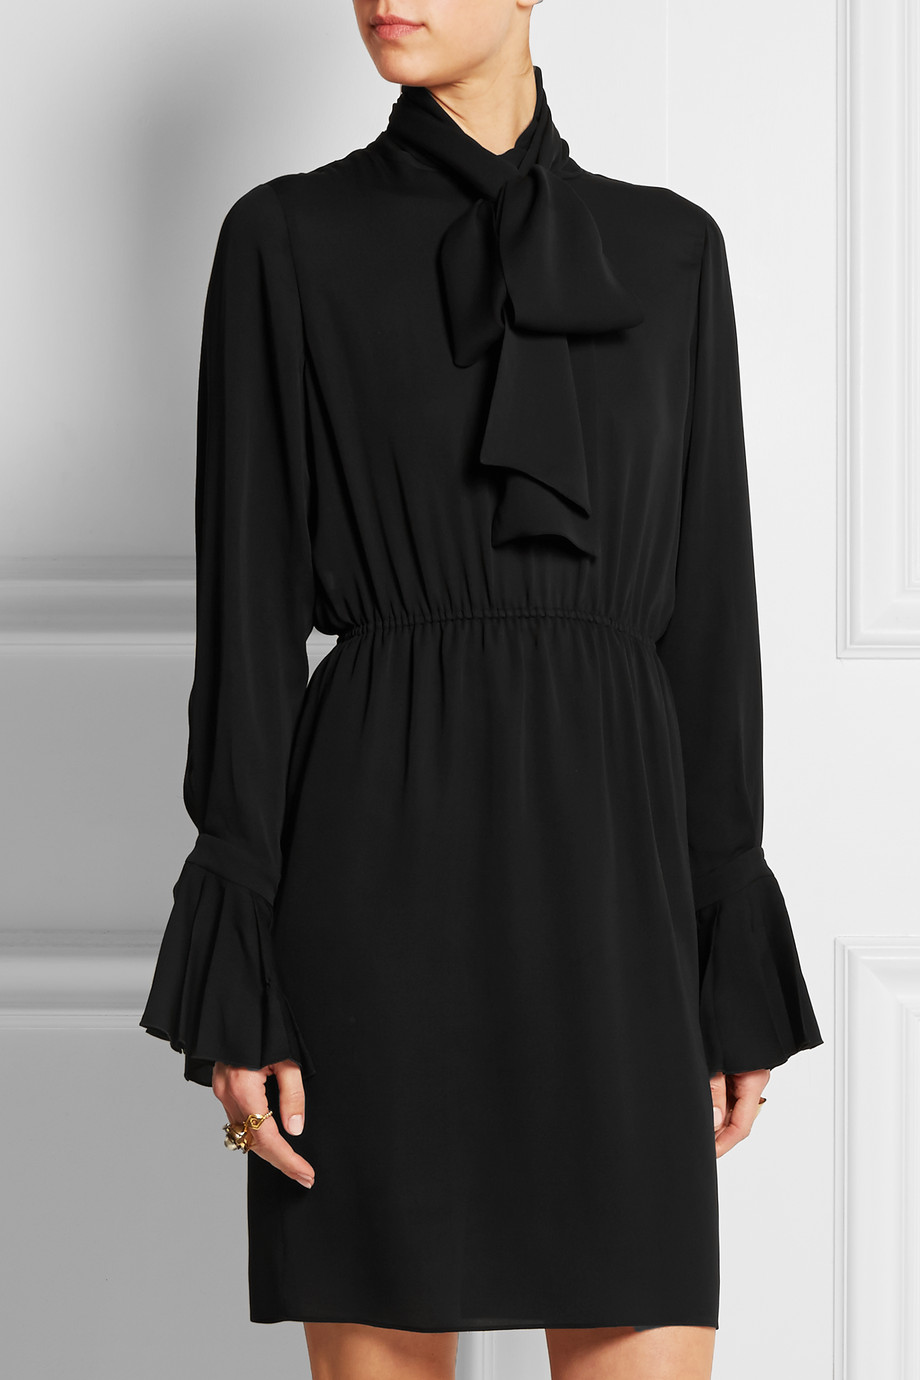 Gucci Pussy-Bow Silk-Georgette Dress, Black, Women's, Size: 44